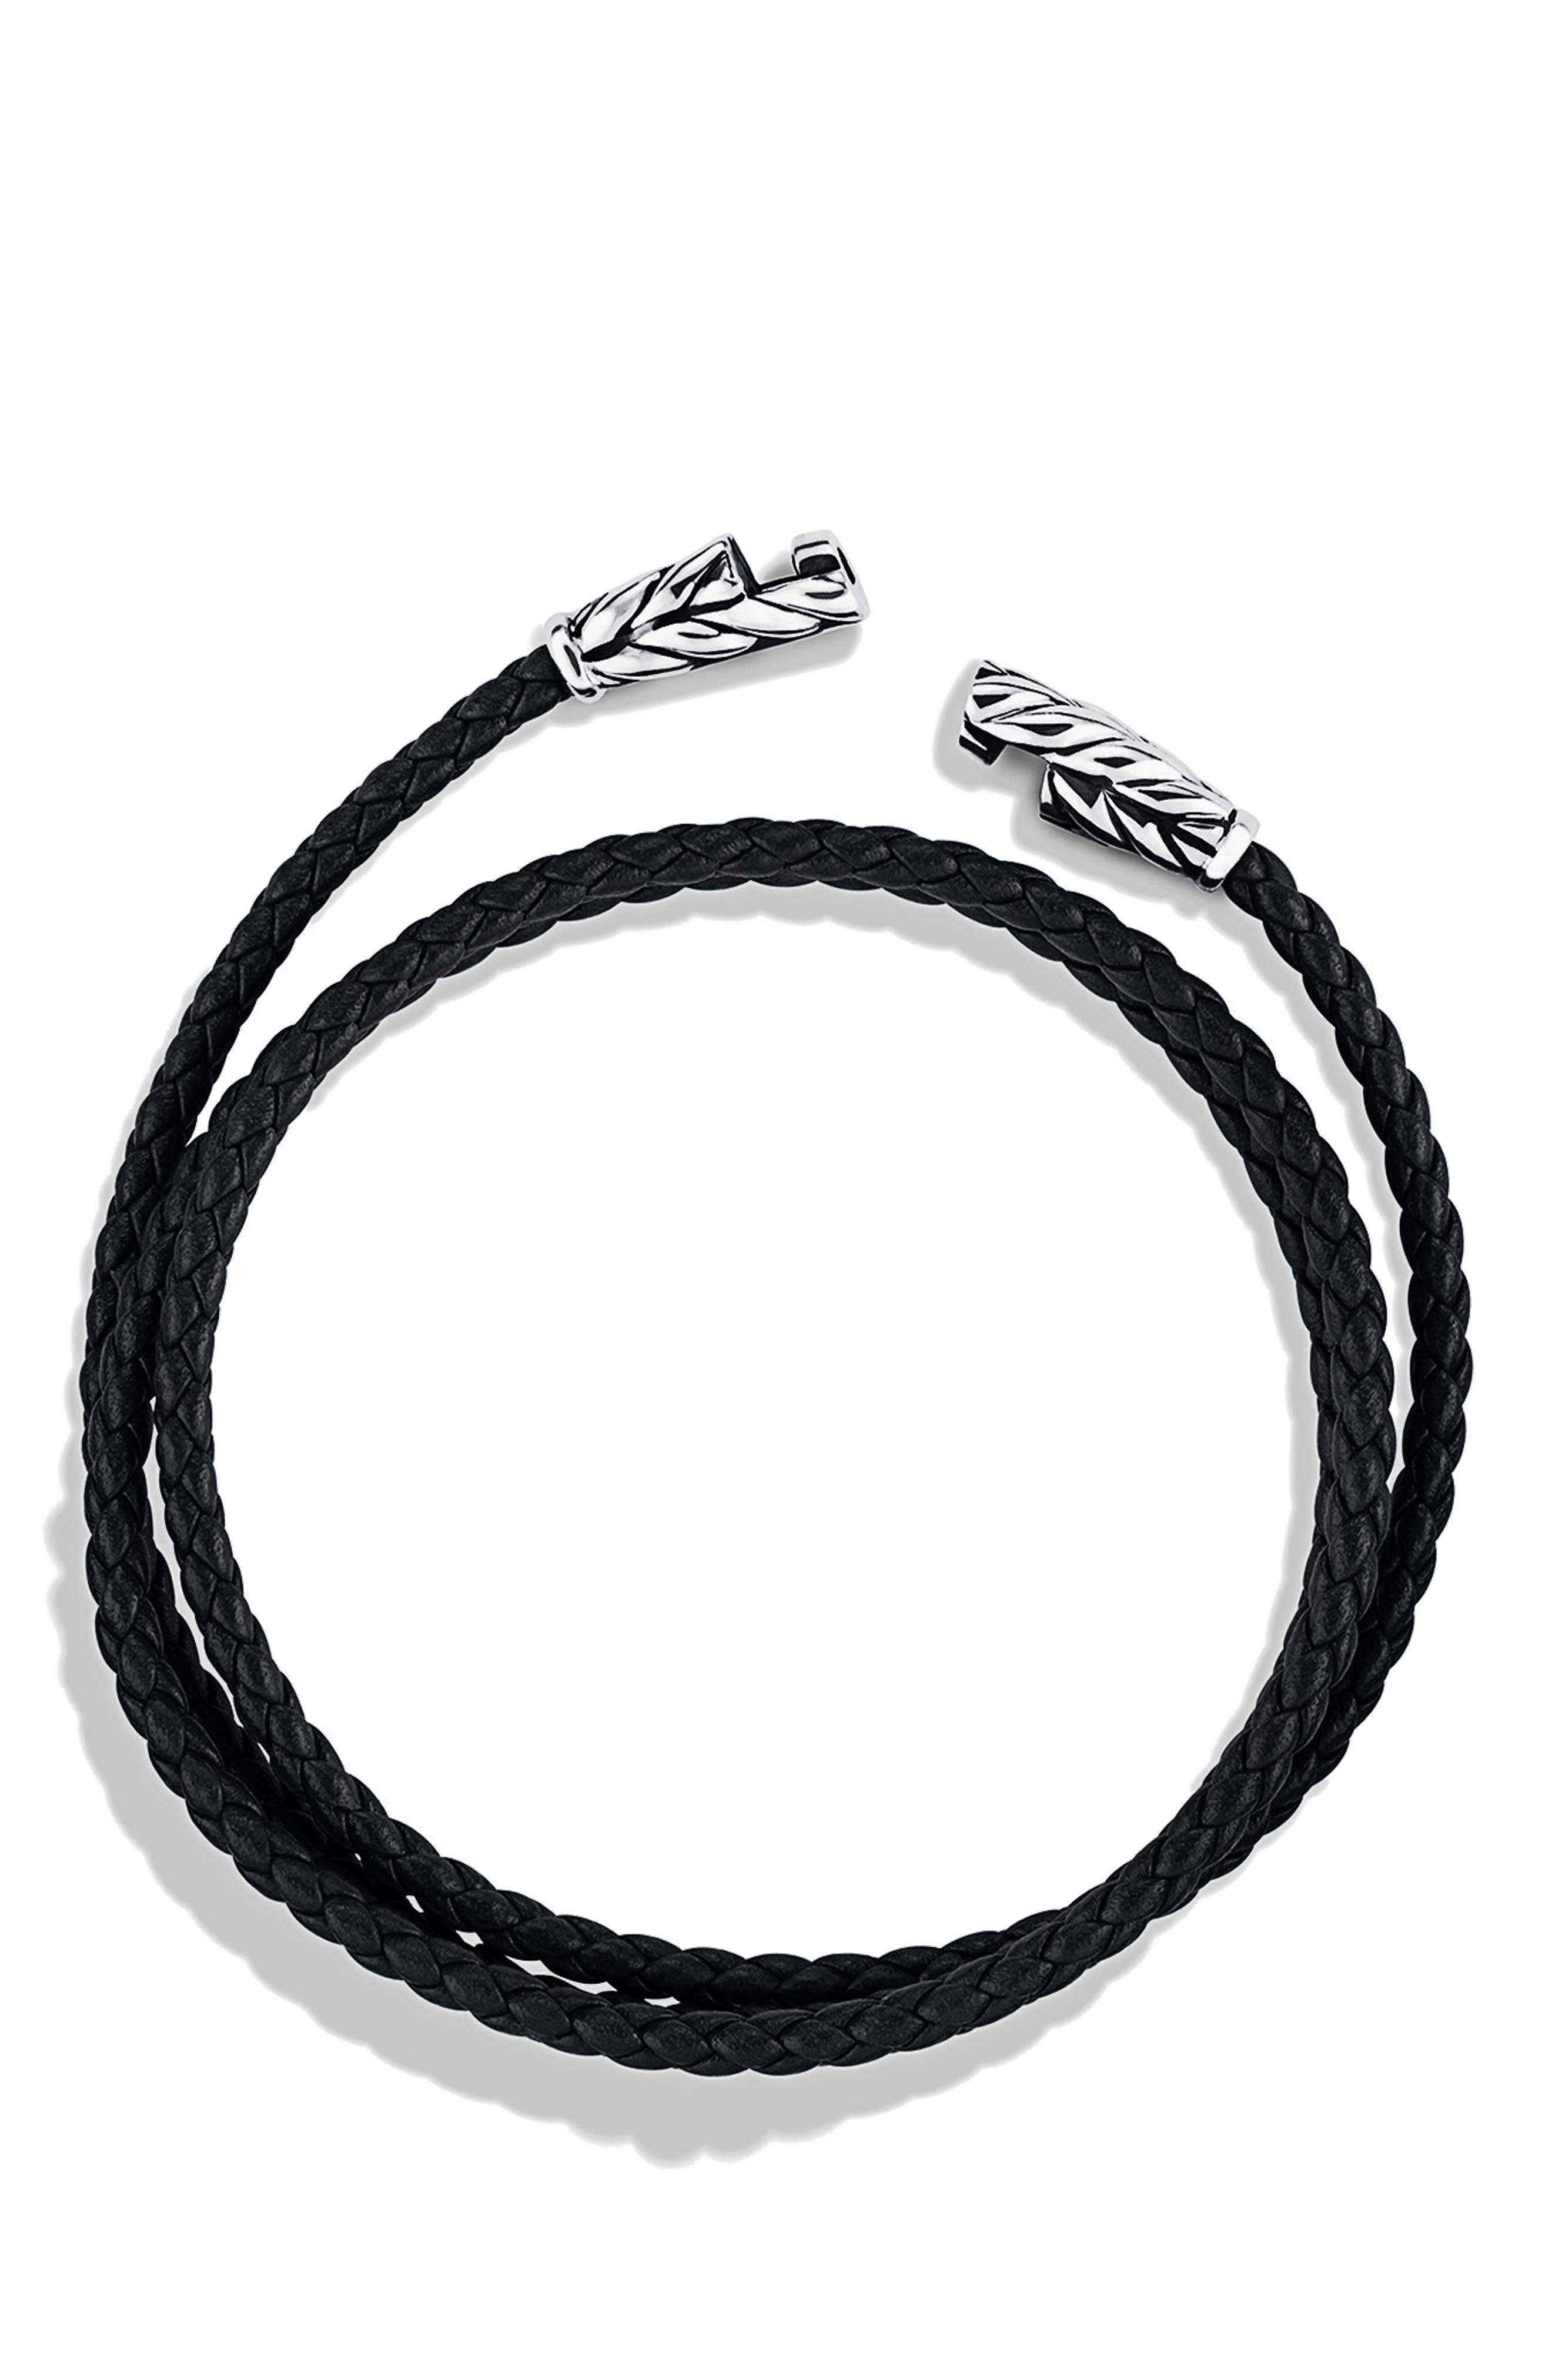 DAVID YURMAN, 'Chevron' Triple-Wrap Bracelet, Alternate thumbnail 2, color, BLACK LEATHER